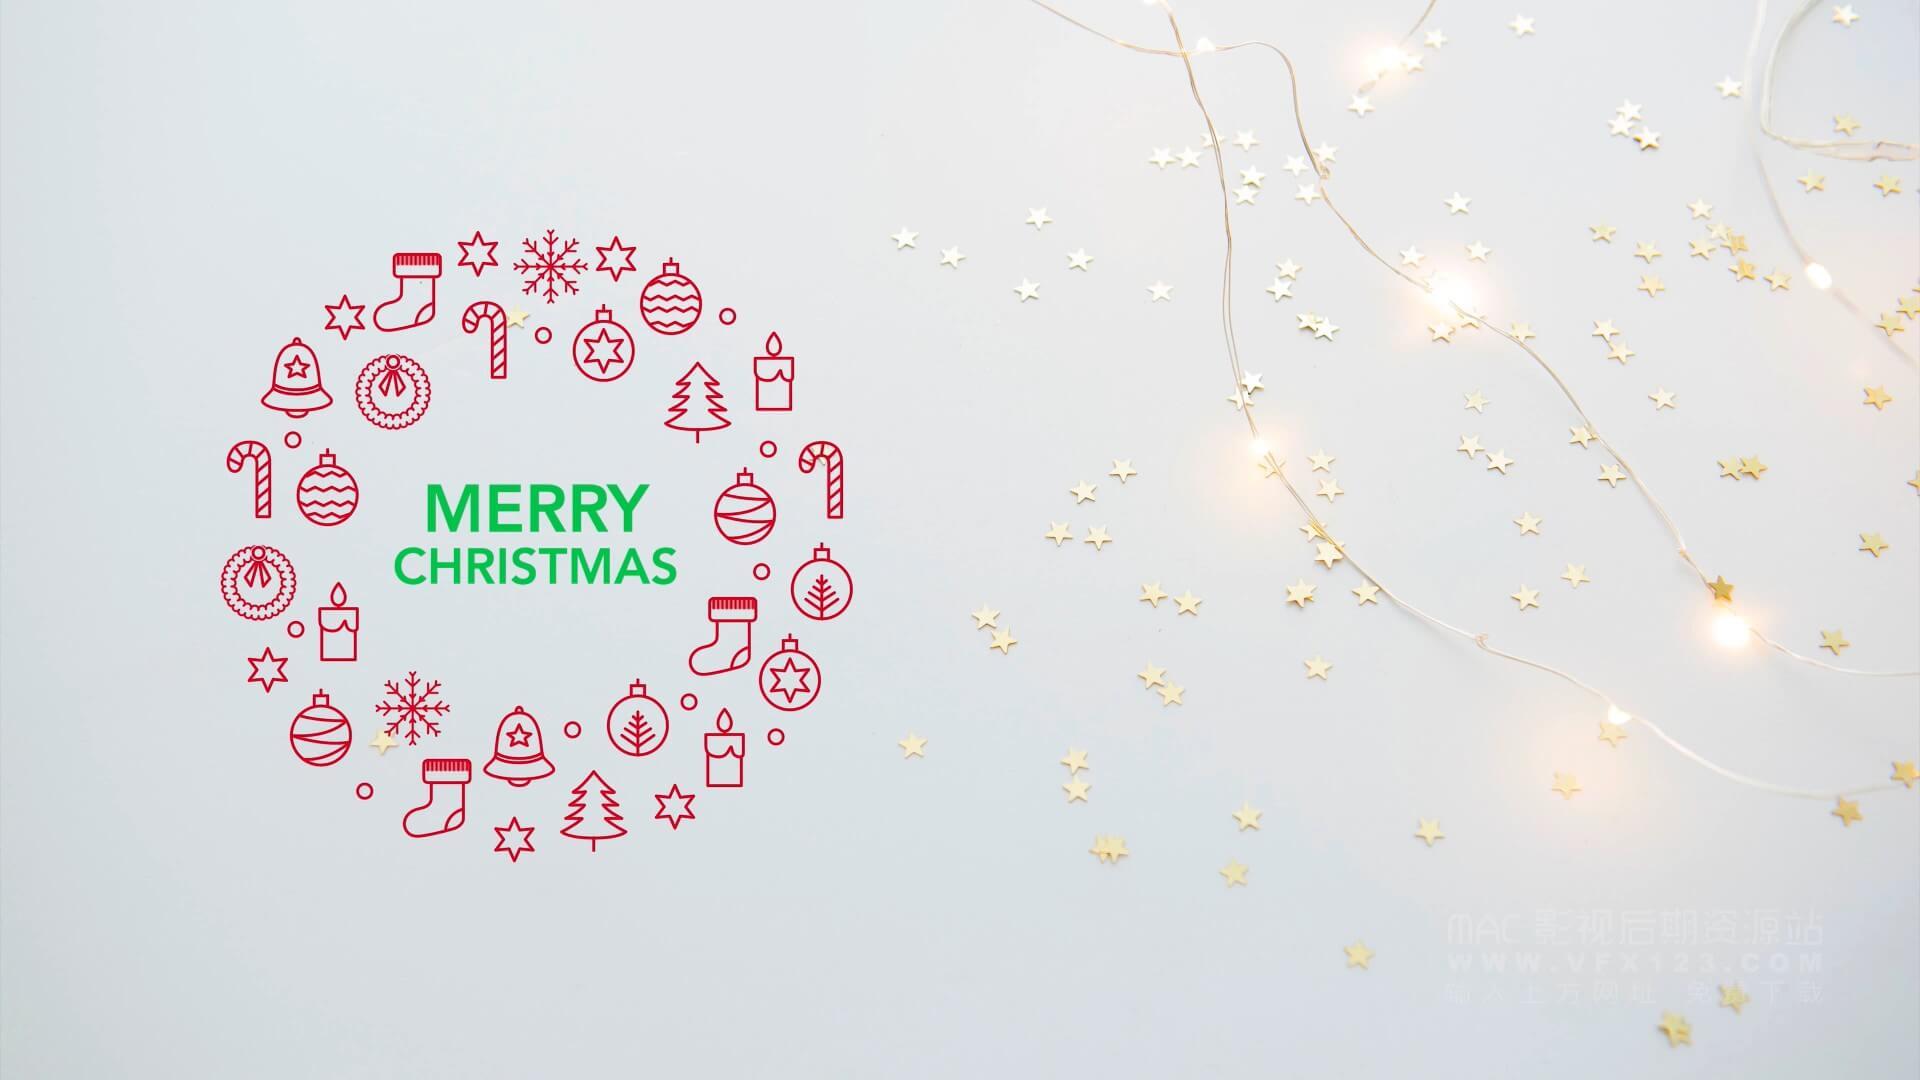 fcpx插件 14个圣诞节标题模板 christmas titles